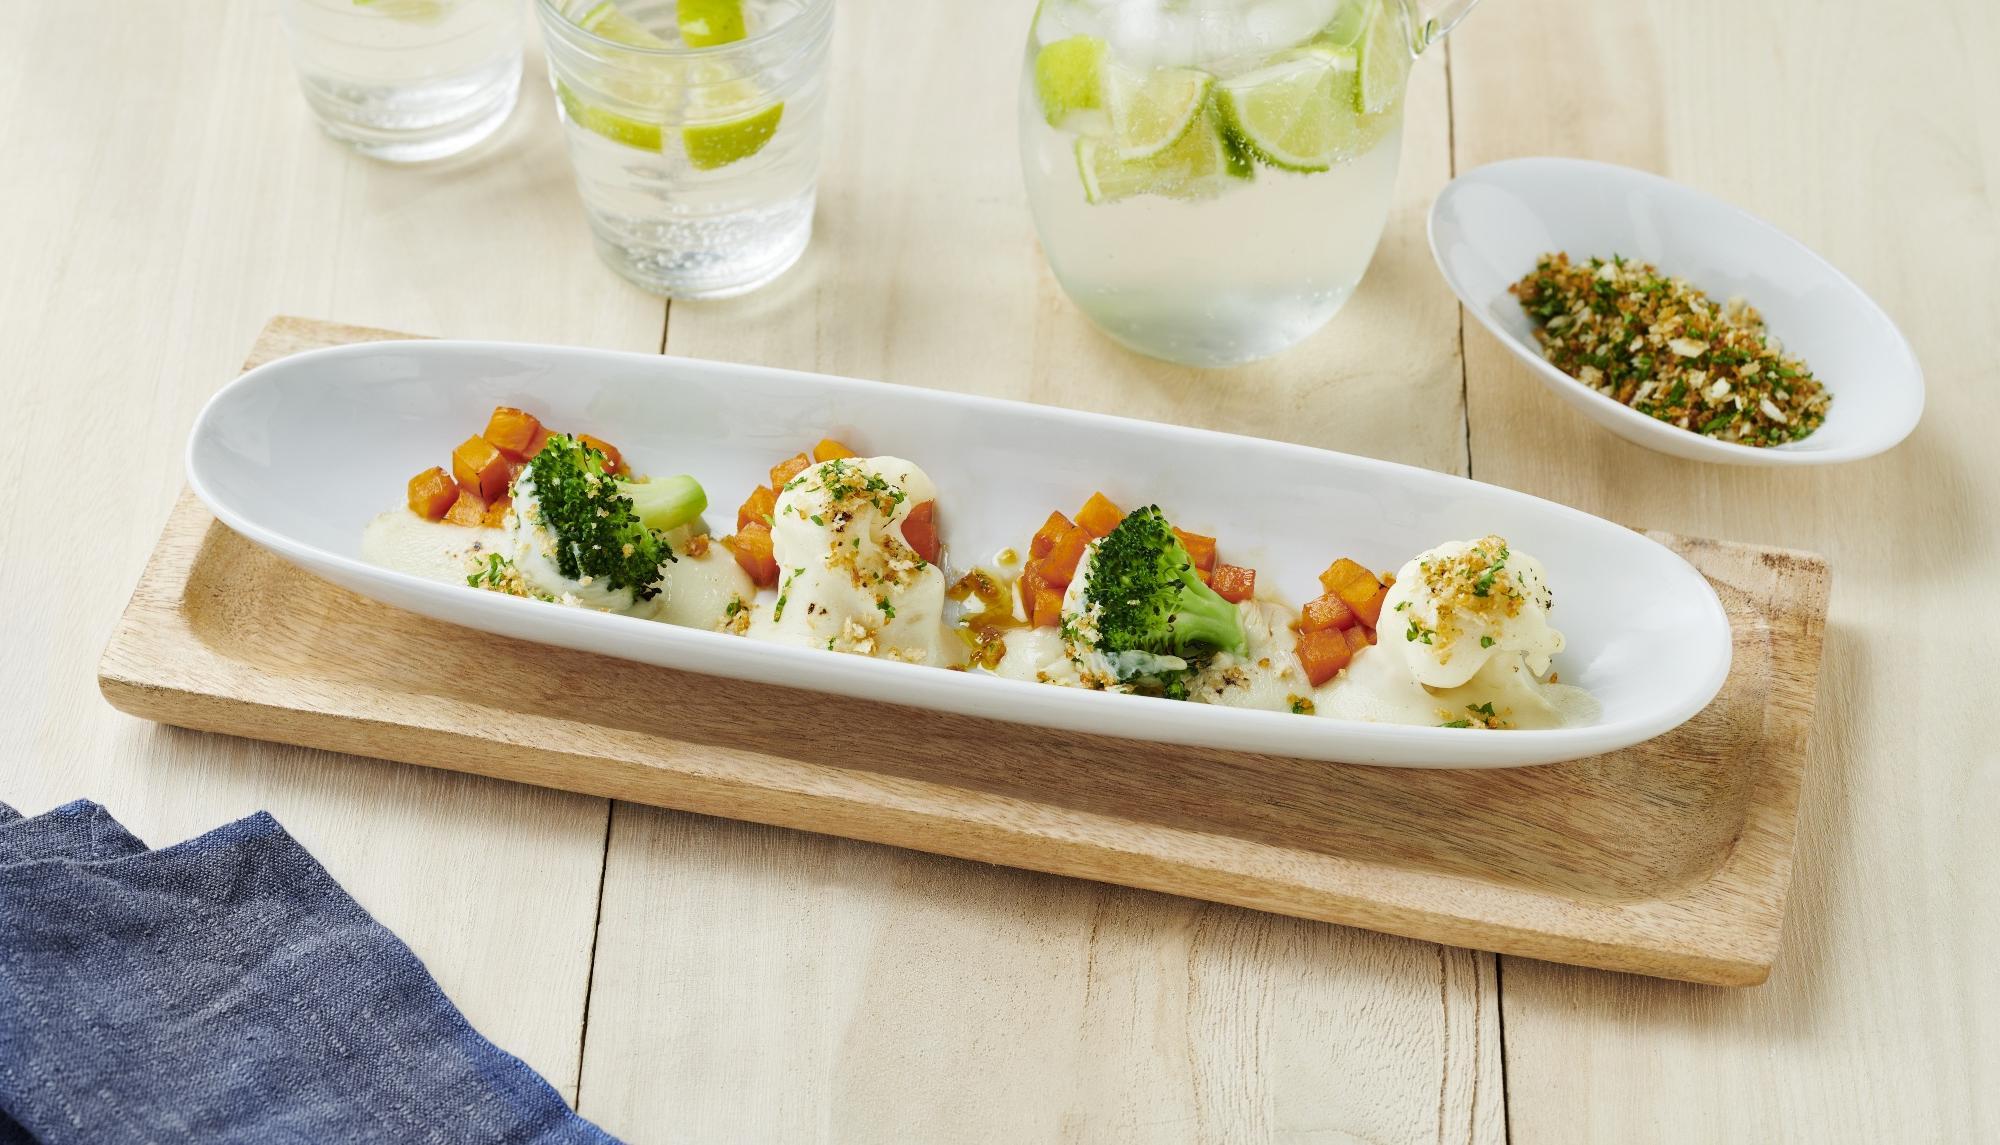 Broccoli Au Gratin Cauliflower And Glazed Sweet Pumpkin With Crispy Soy Sauce Crumbles Kikkoman Recipes